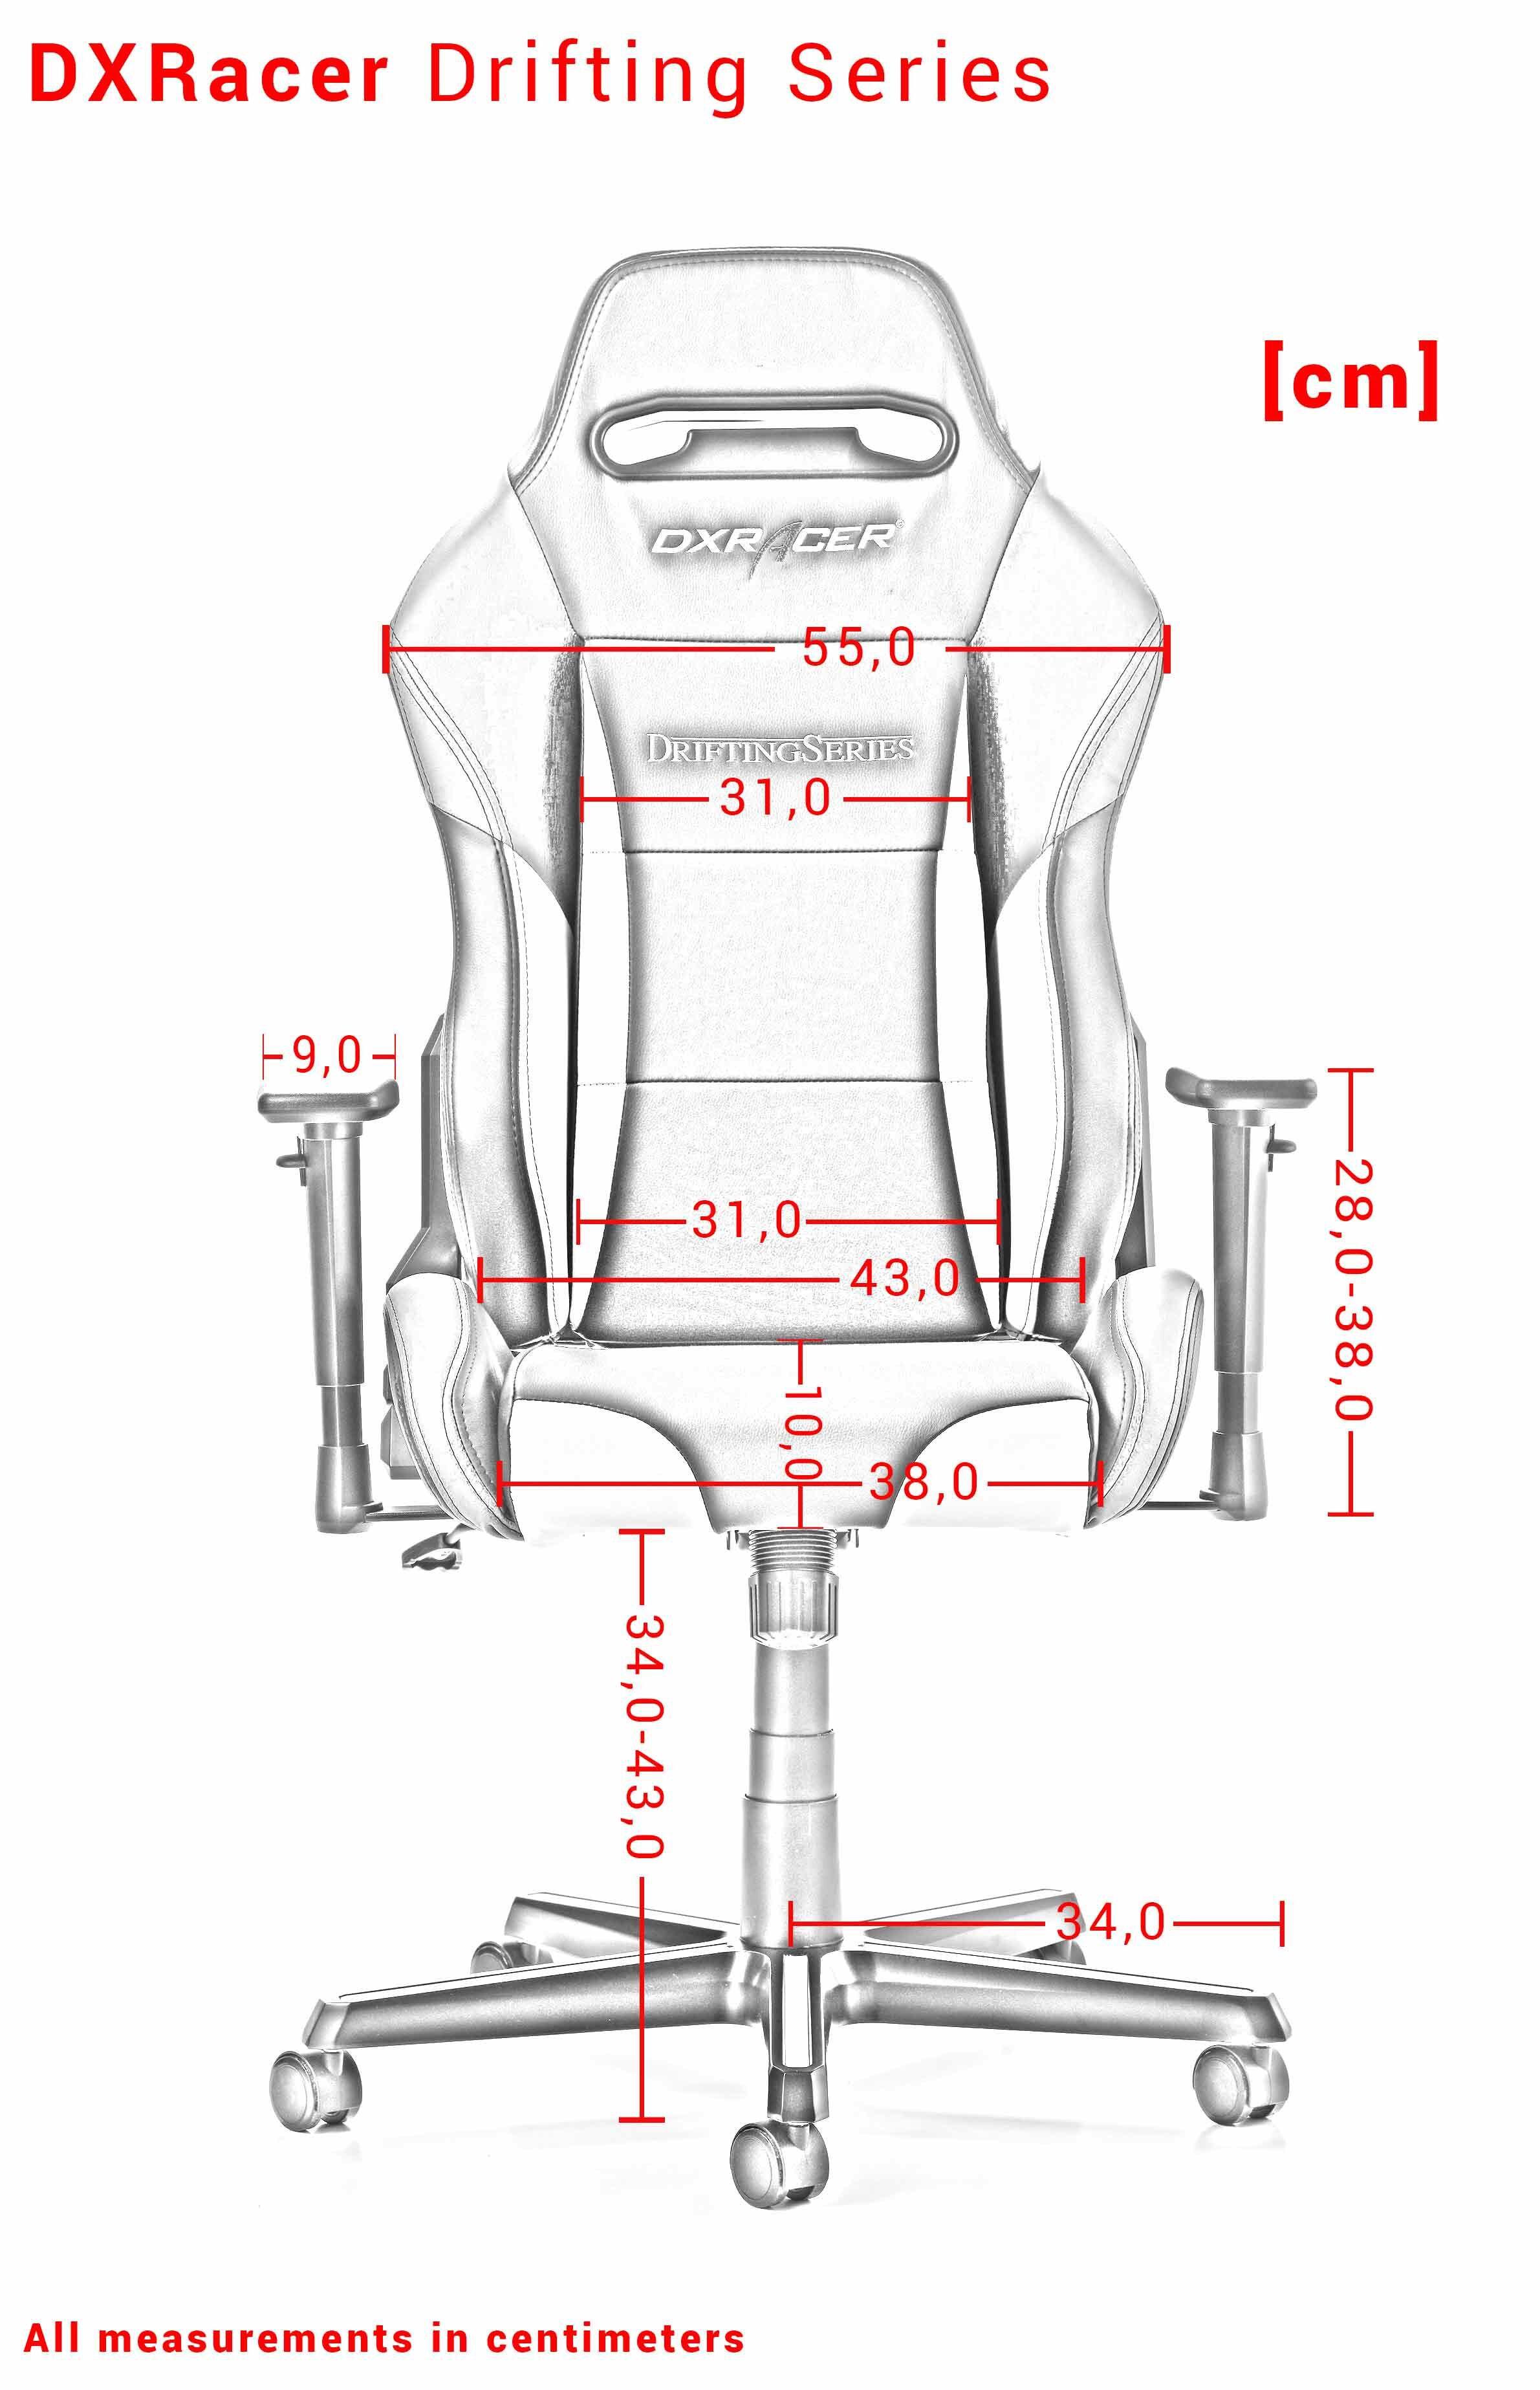 DXRACER DRIFTING SERIES D166-NE GREEN GAMING CHAIR